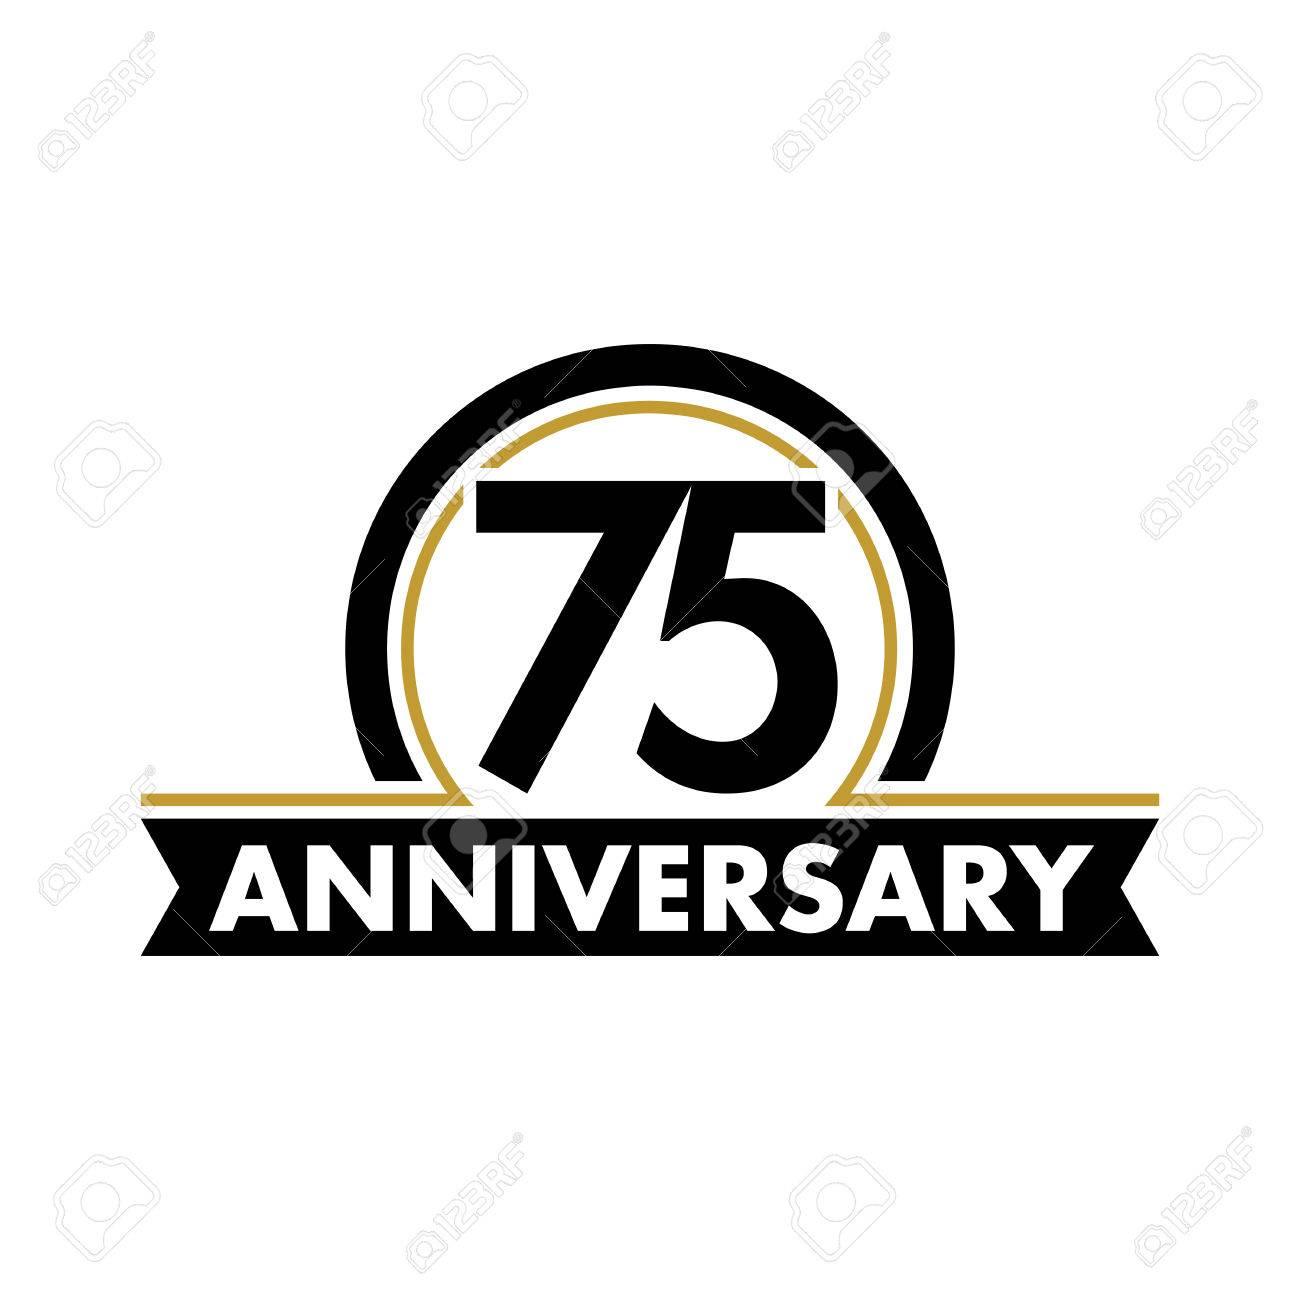 Anniversary Vector Unusual Label Seventy Fifth Anniversary Symbol